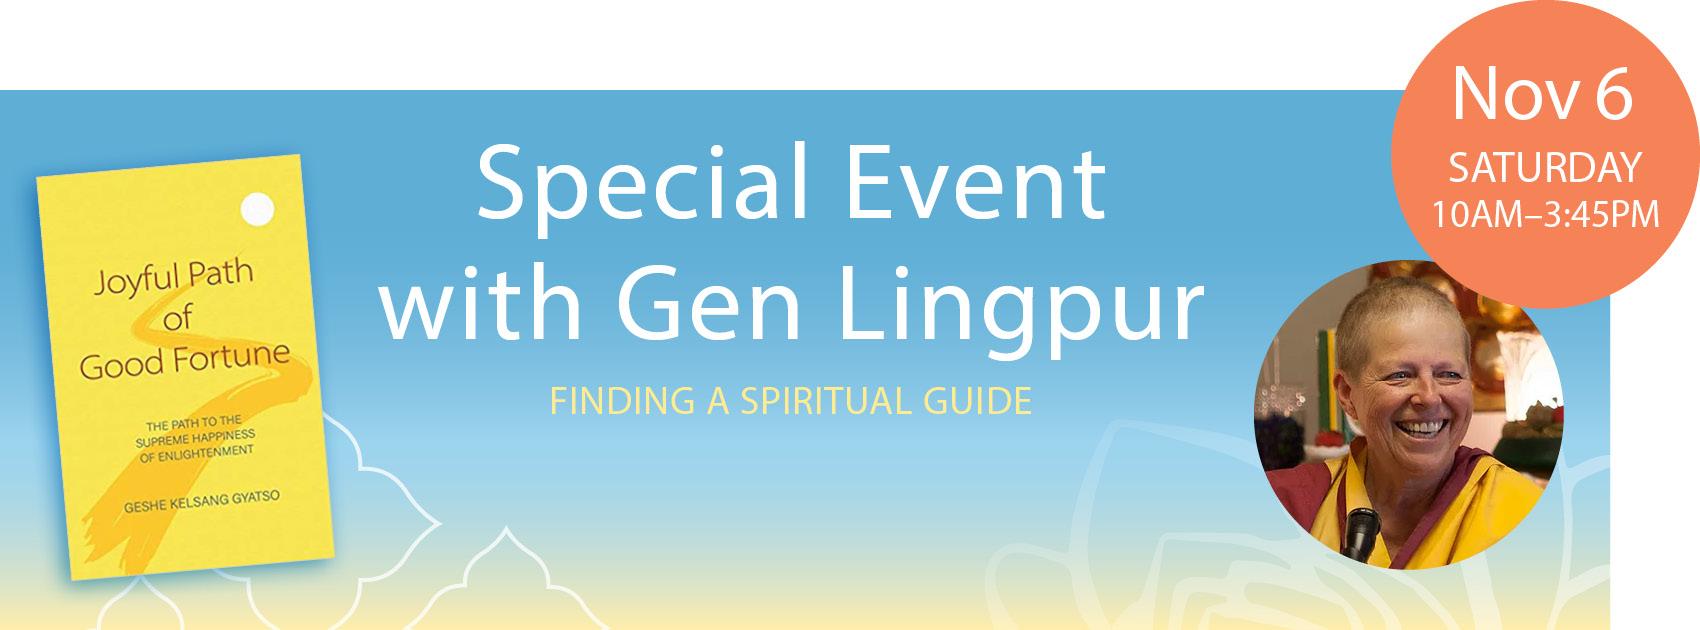 Gen Lingpur Special Event